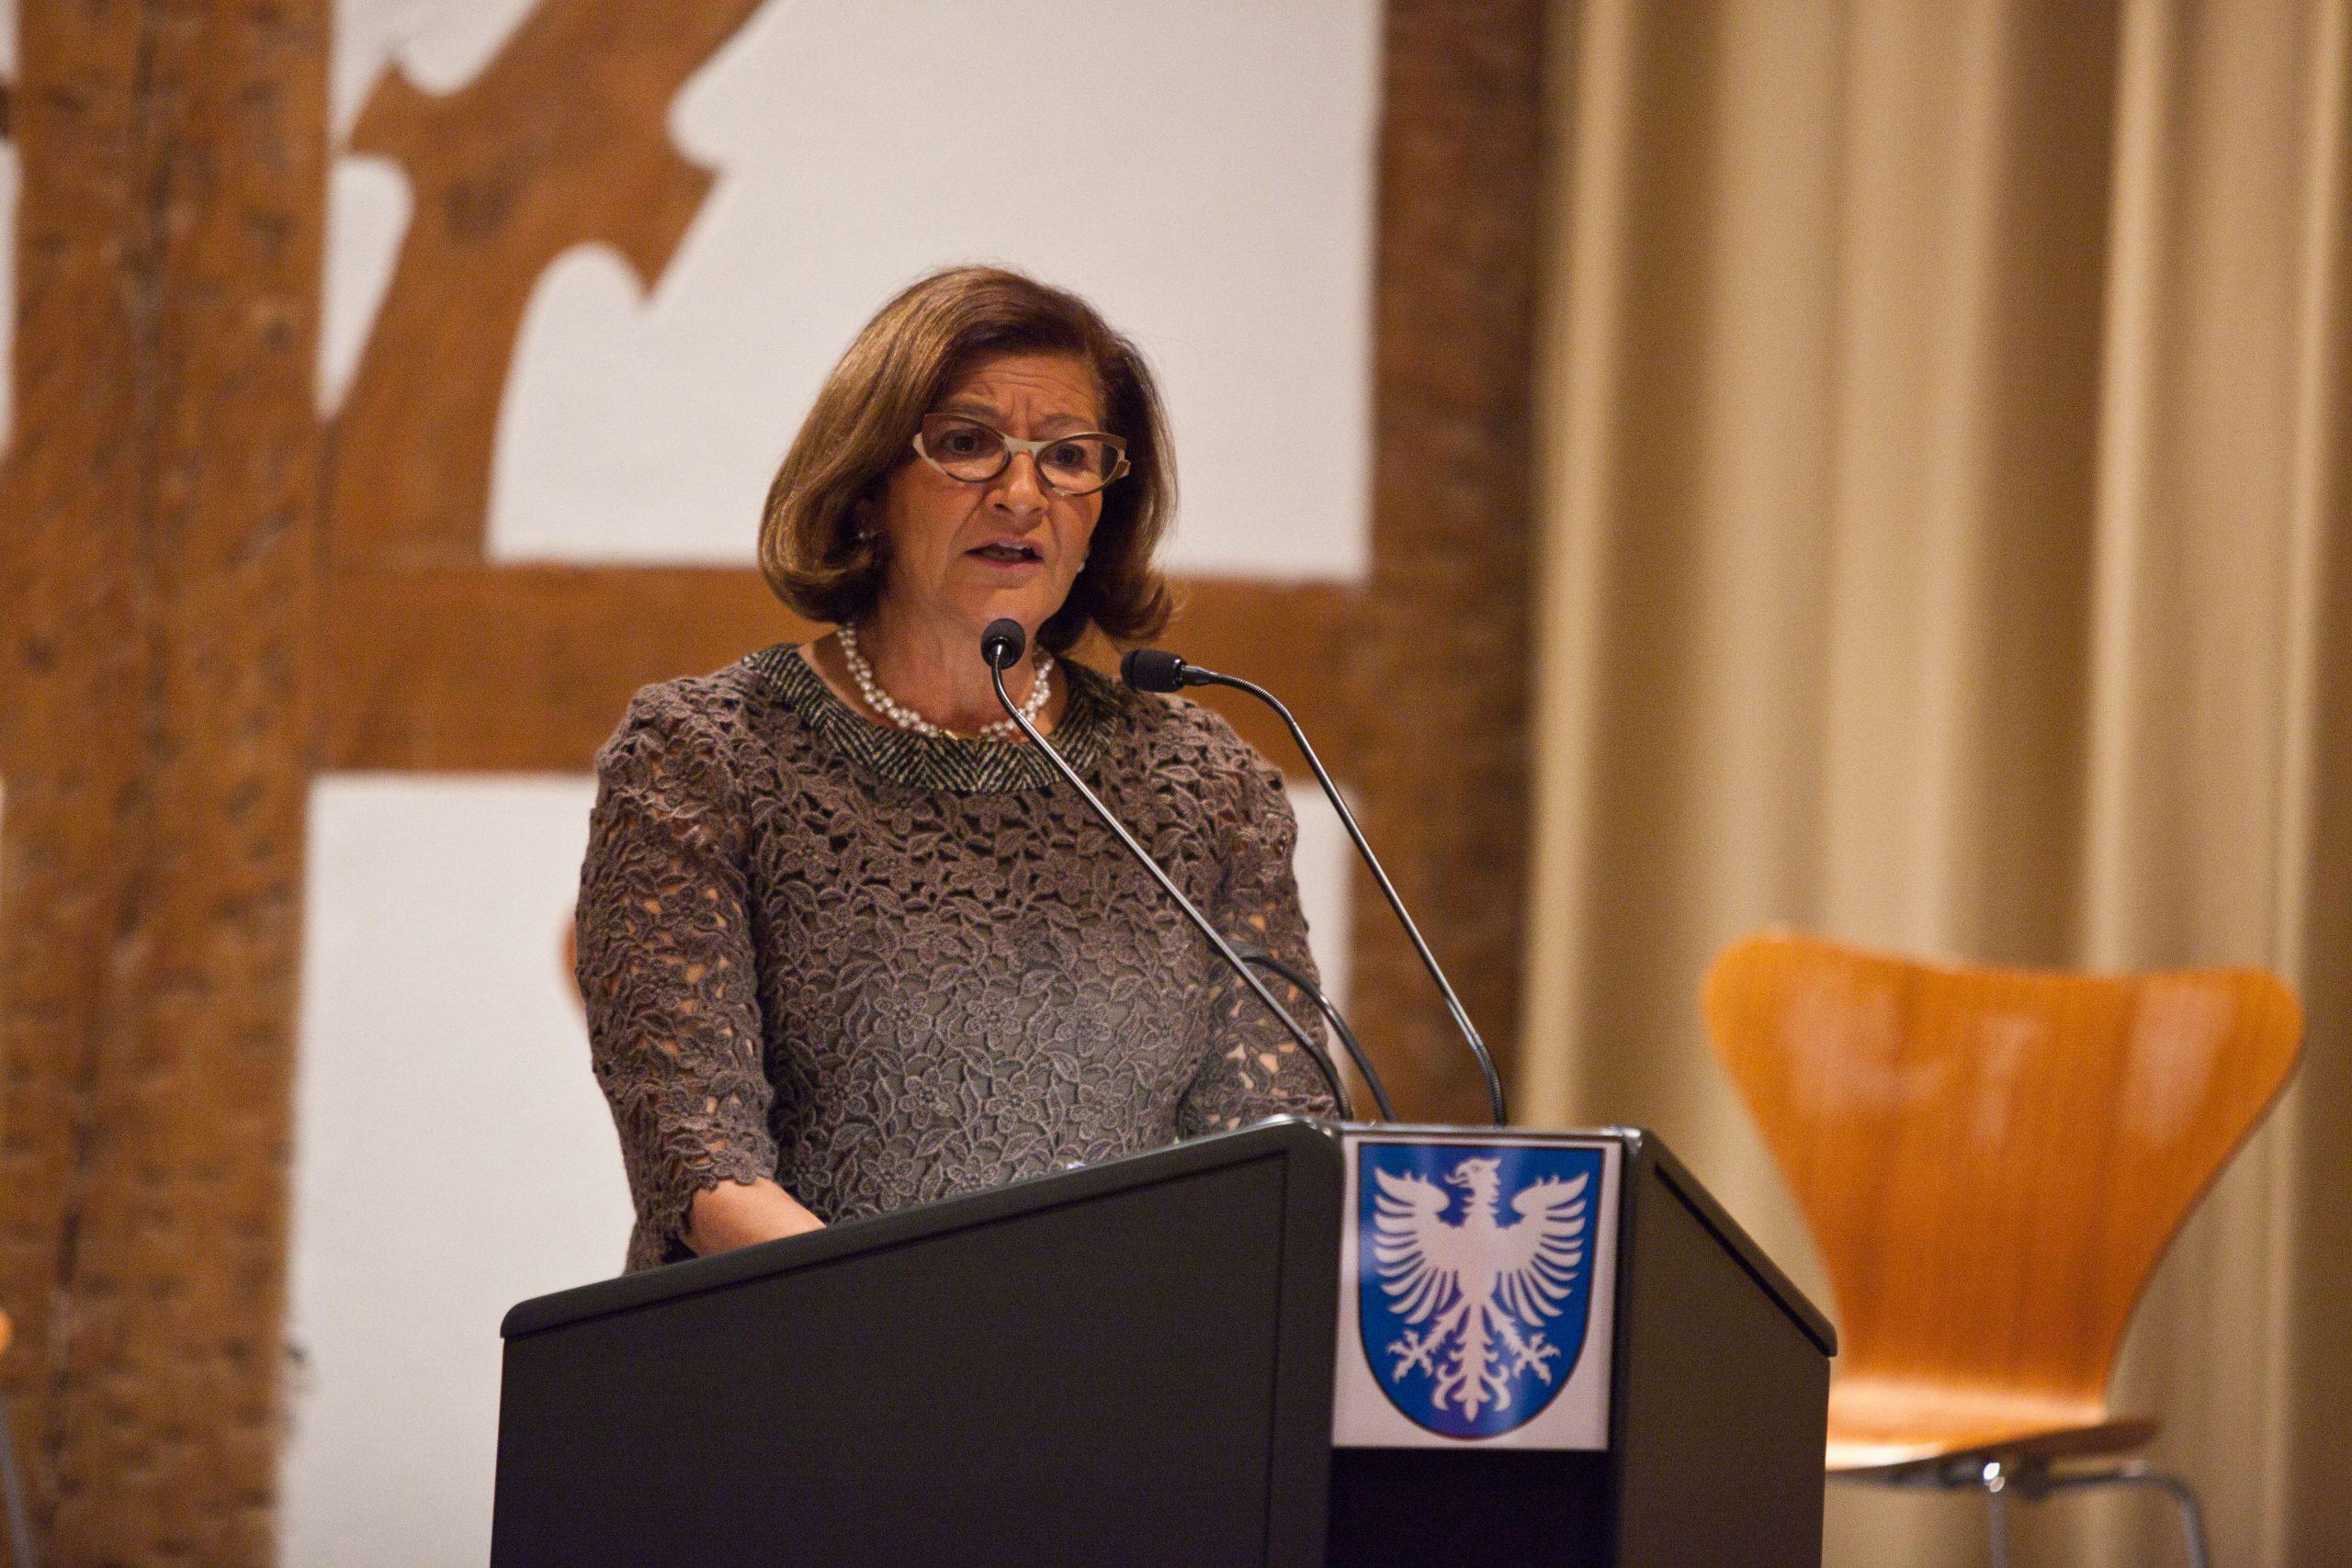 Bürgermeisterin Sorya Lippert begrüßte die Gäste. Foto: Pressebüro Stefan Pfister/Schweinfurt